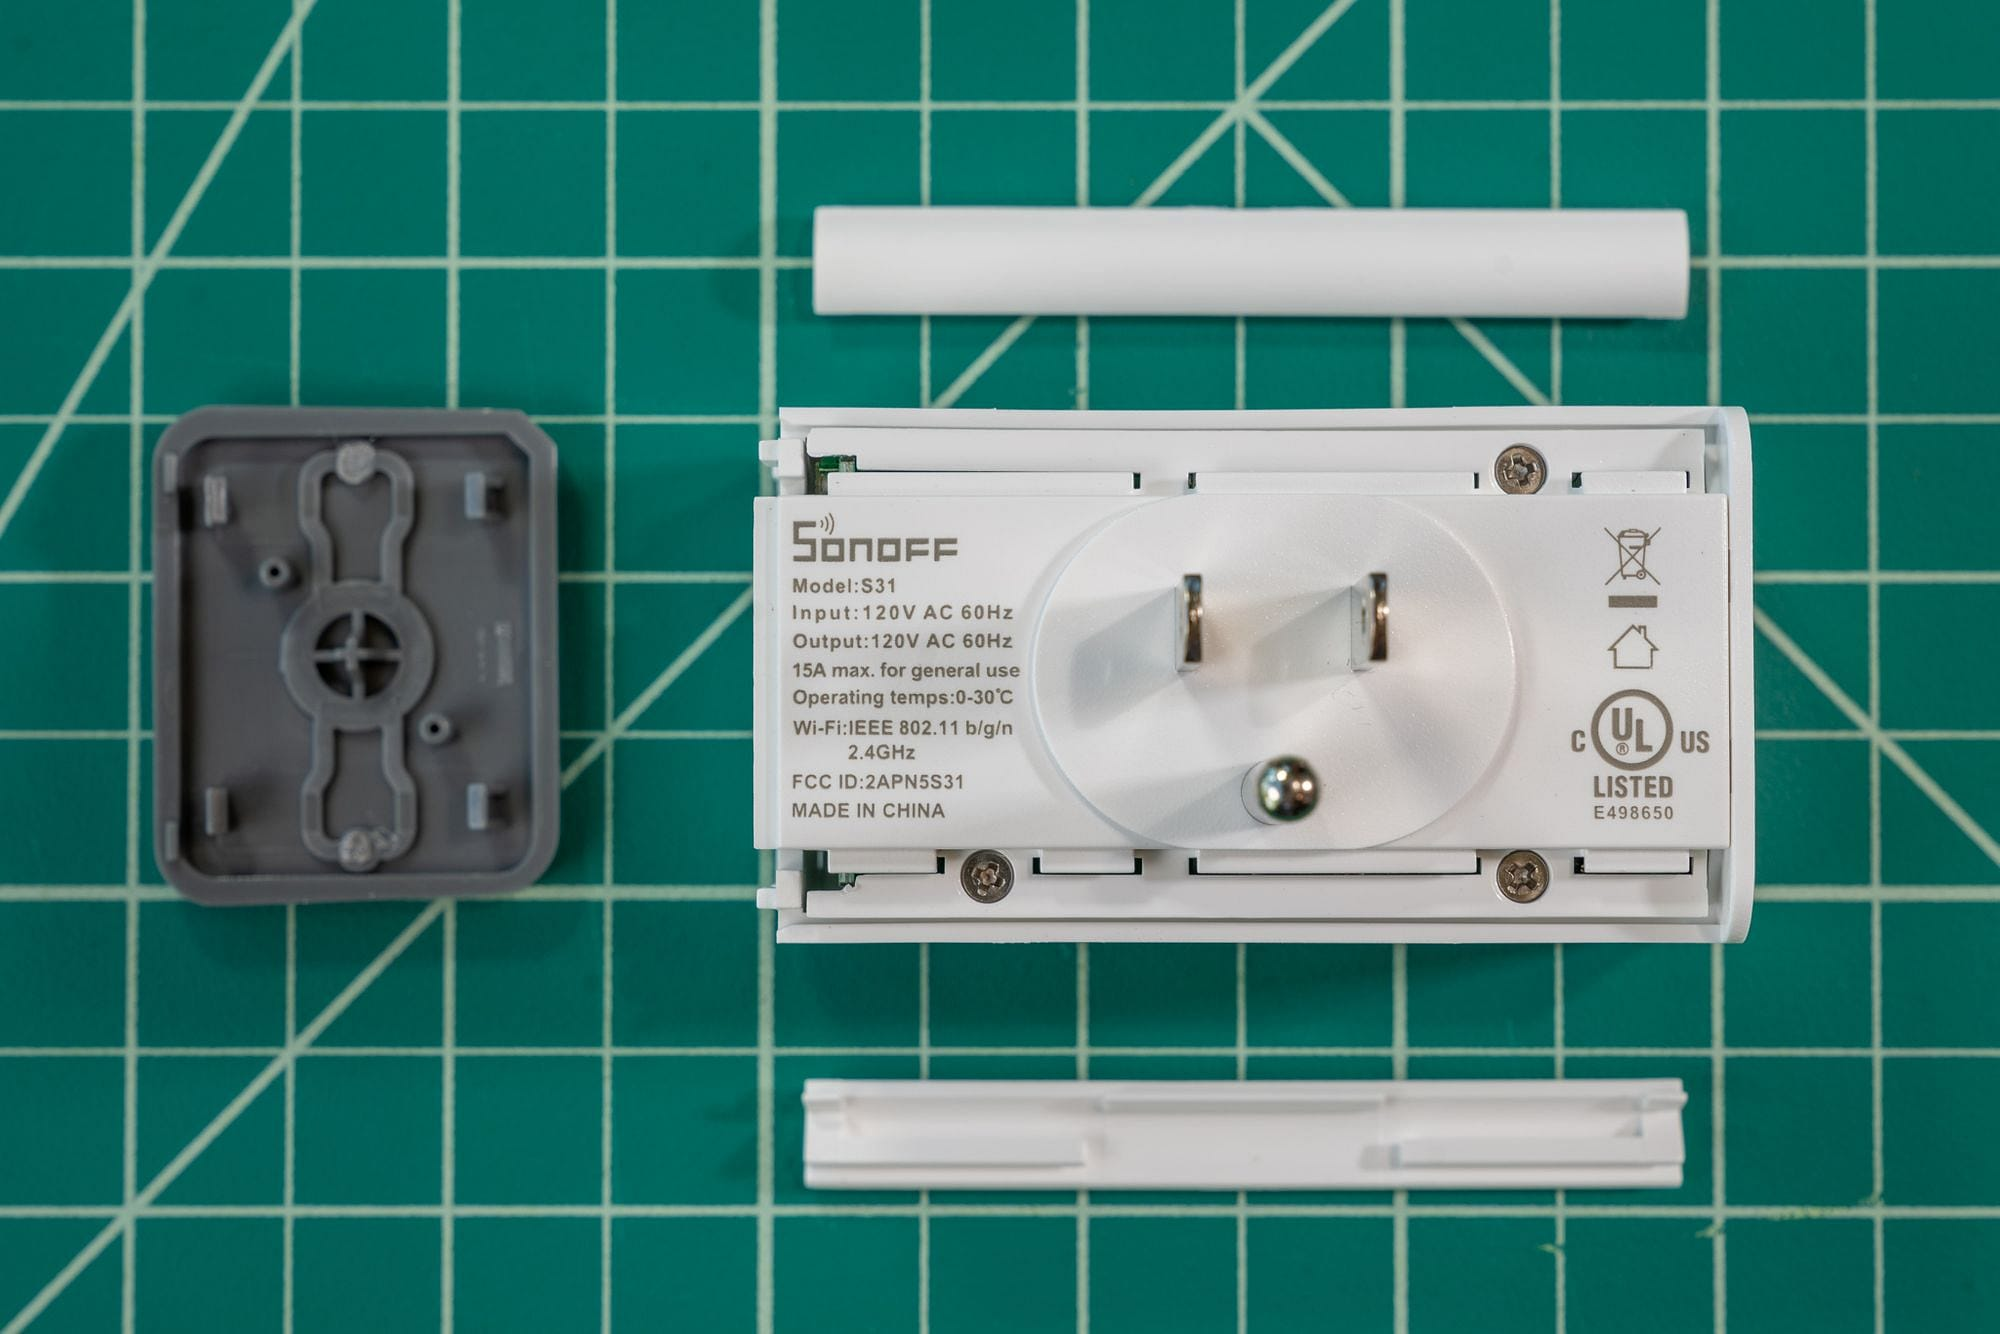 Sonoff S31 Screws